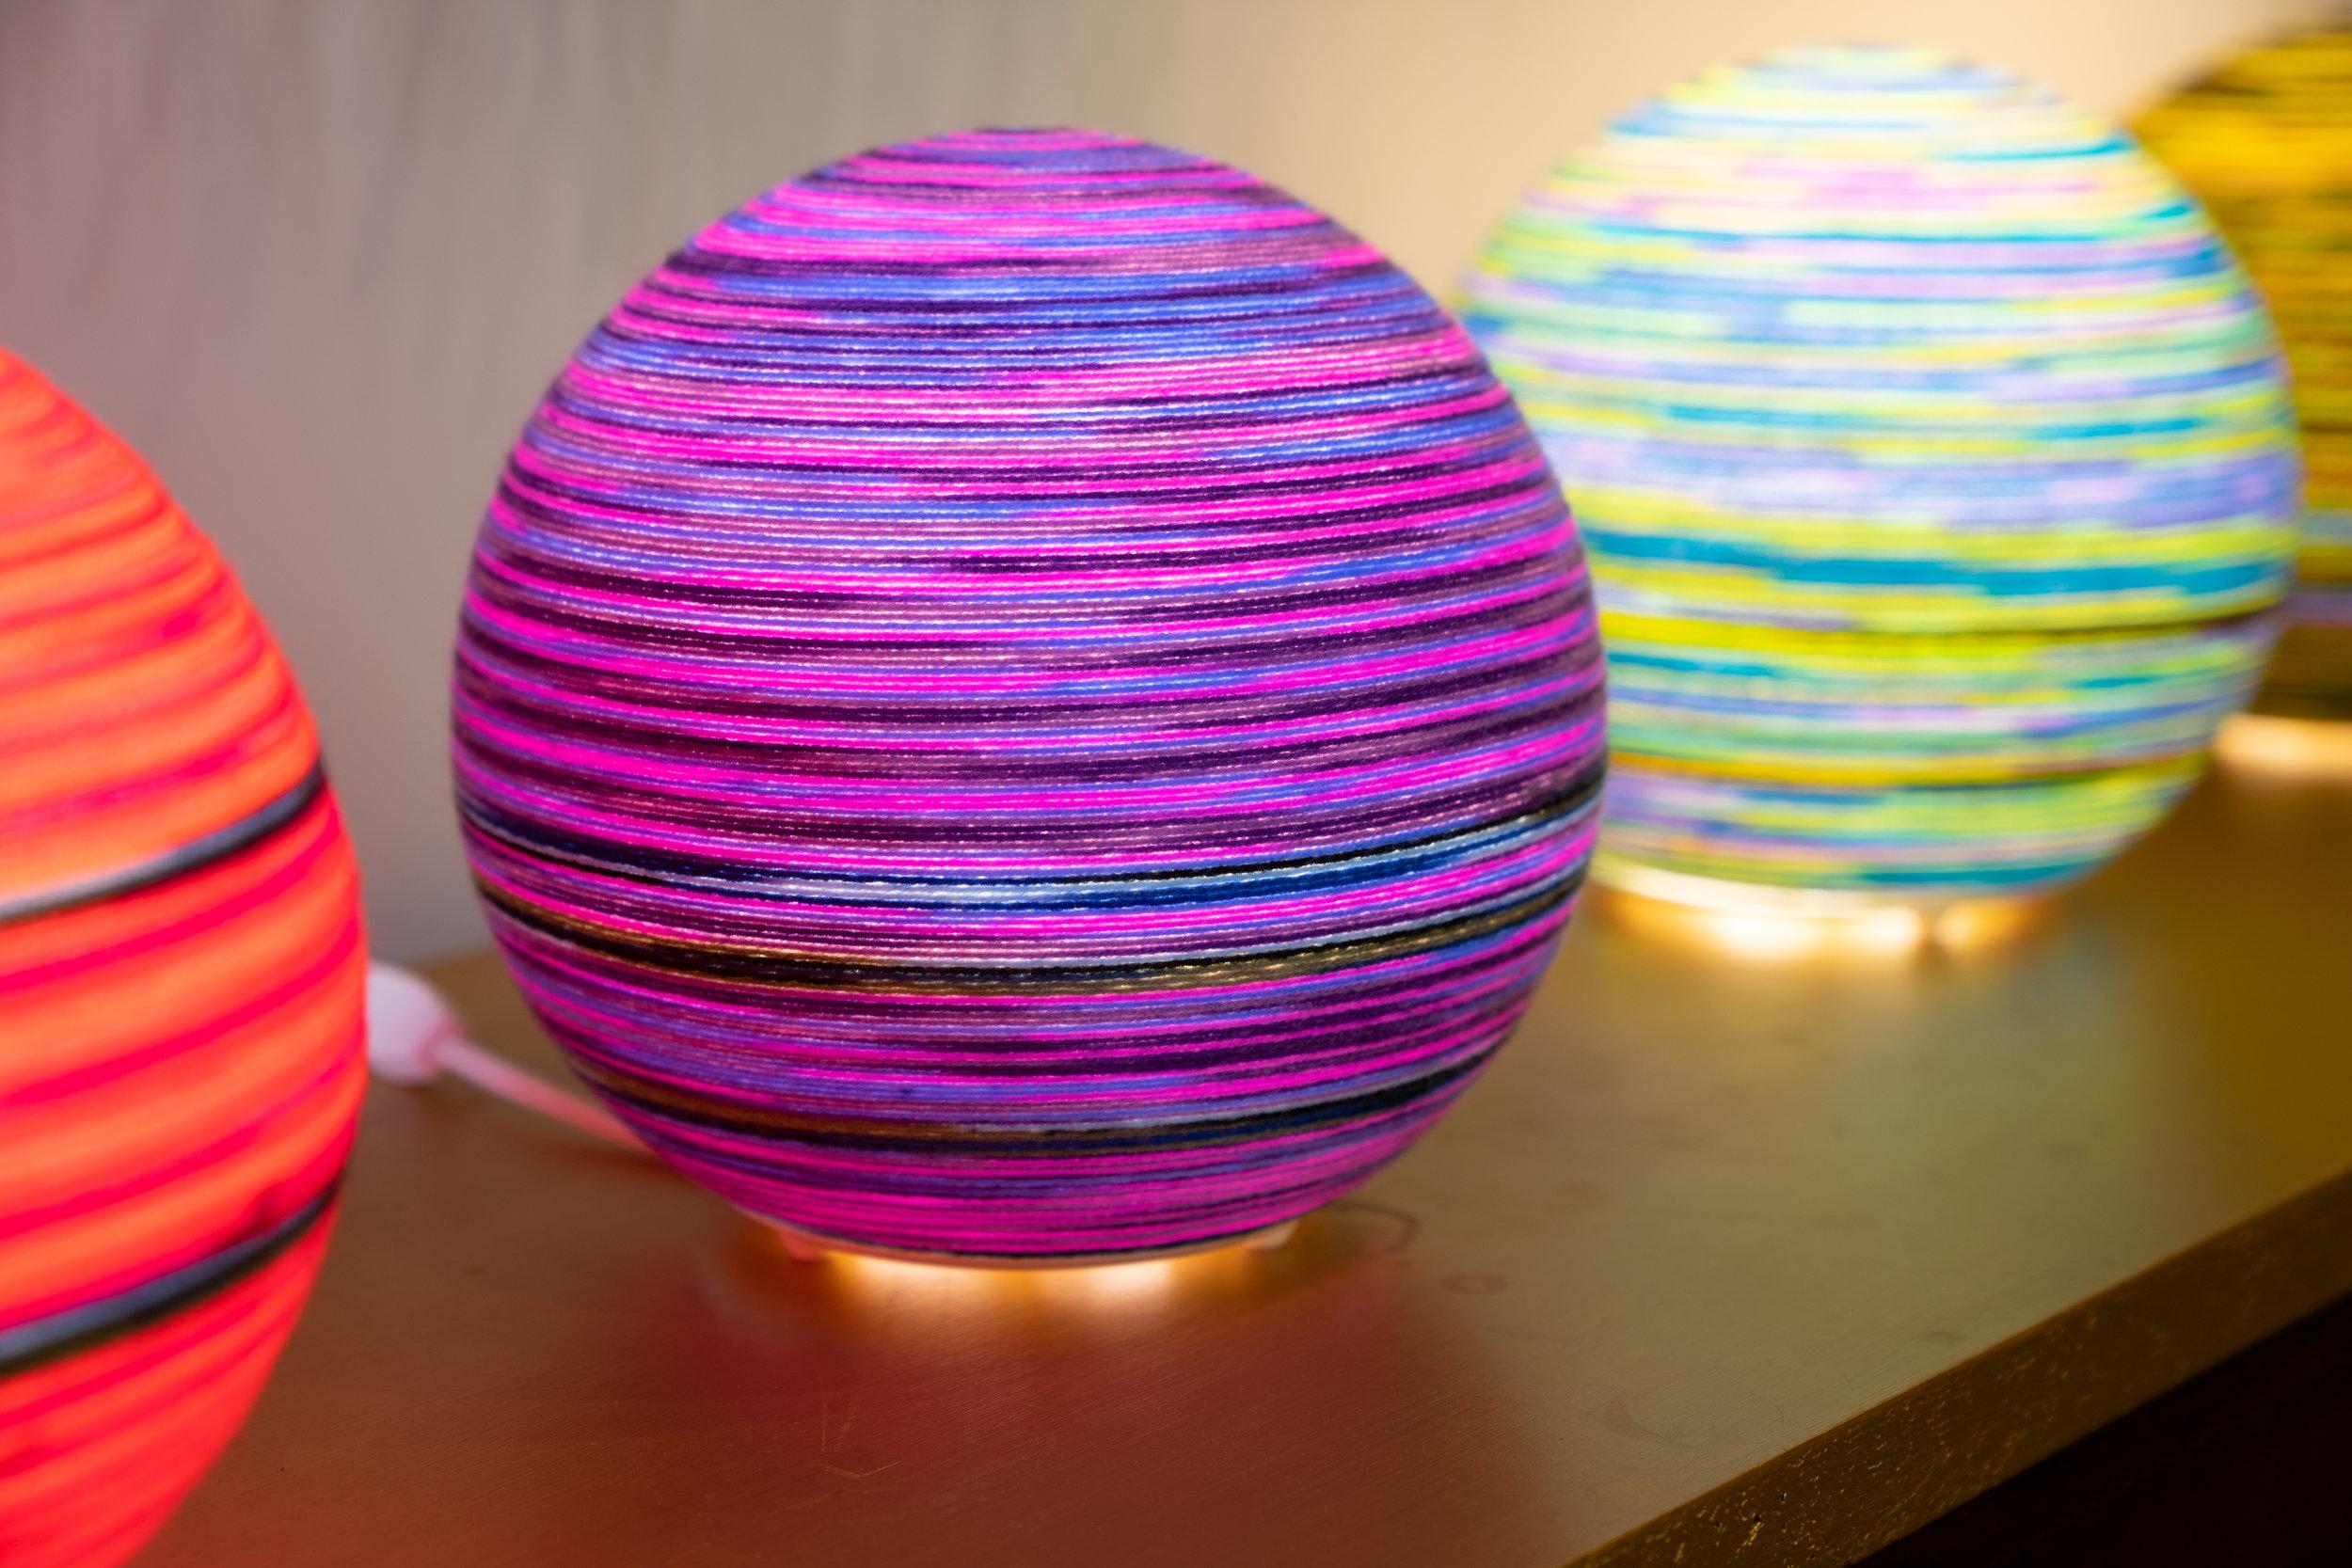 Hallie Rae Ward - Positive Glow Globes - East Austin studio Tour - Austin Artist - Austin Art - contemporary art